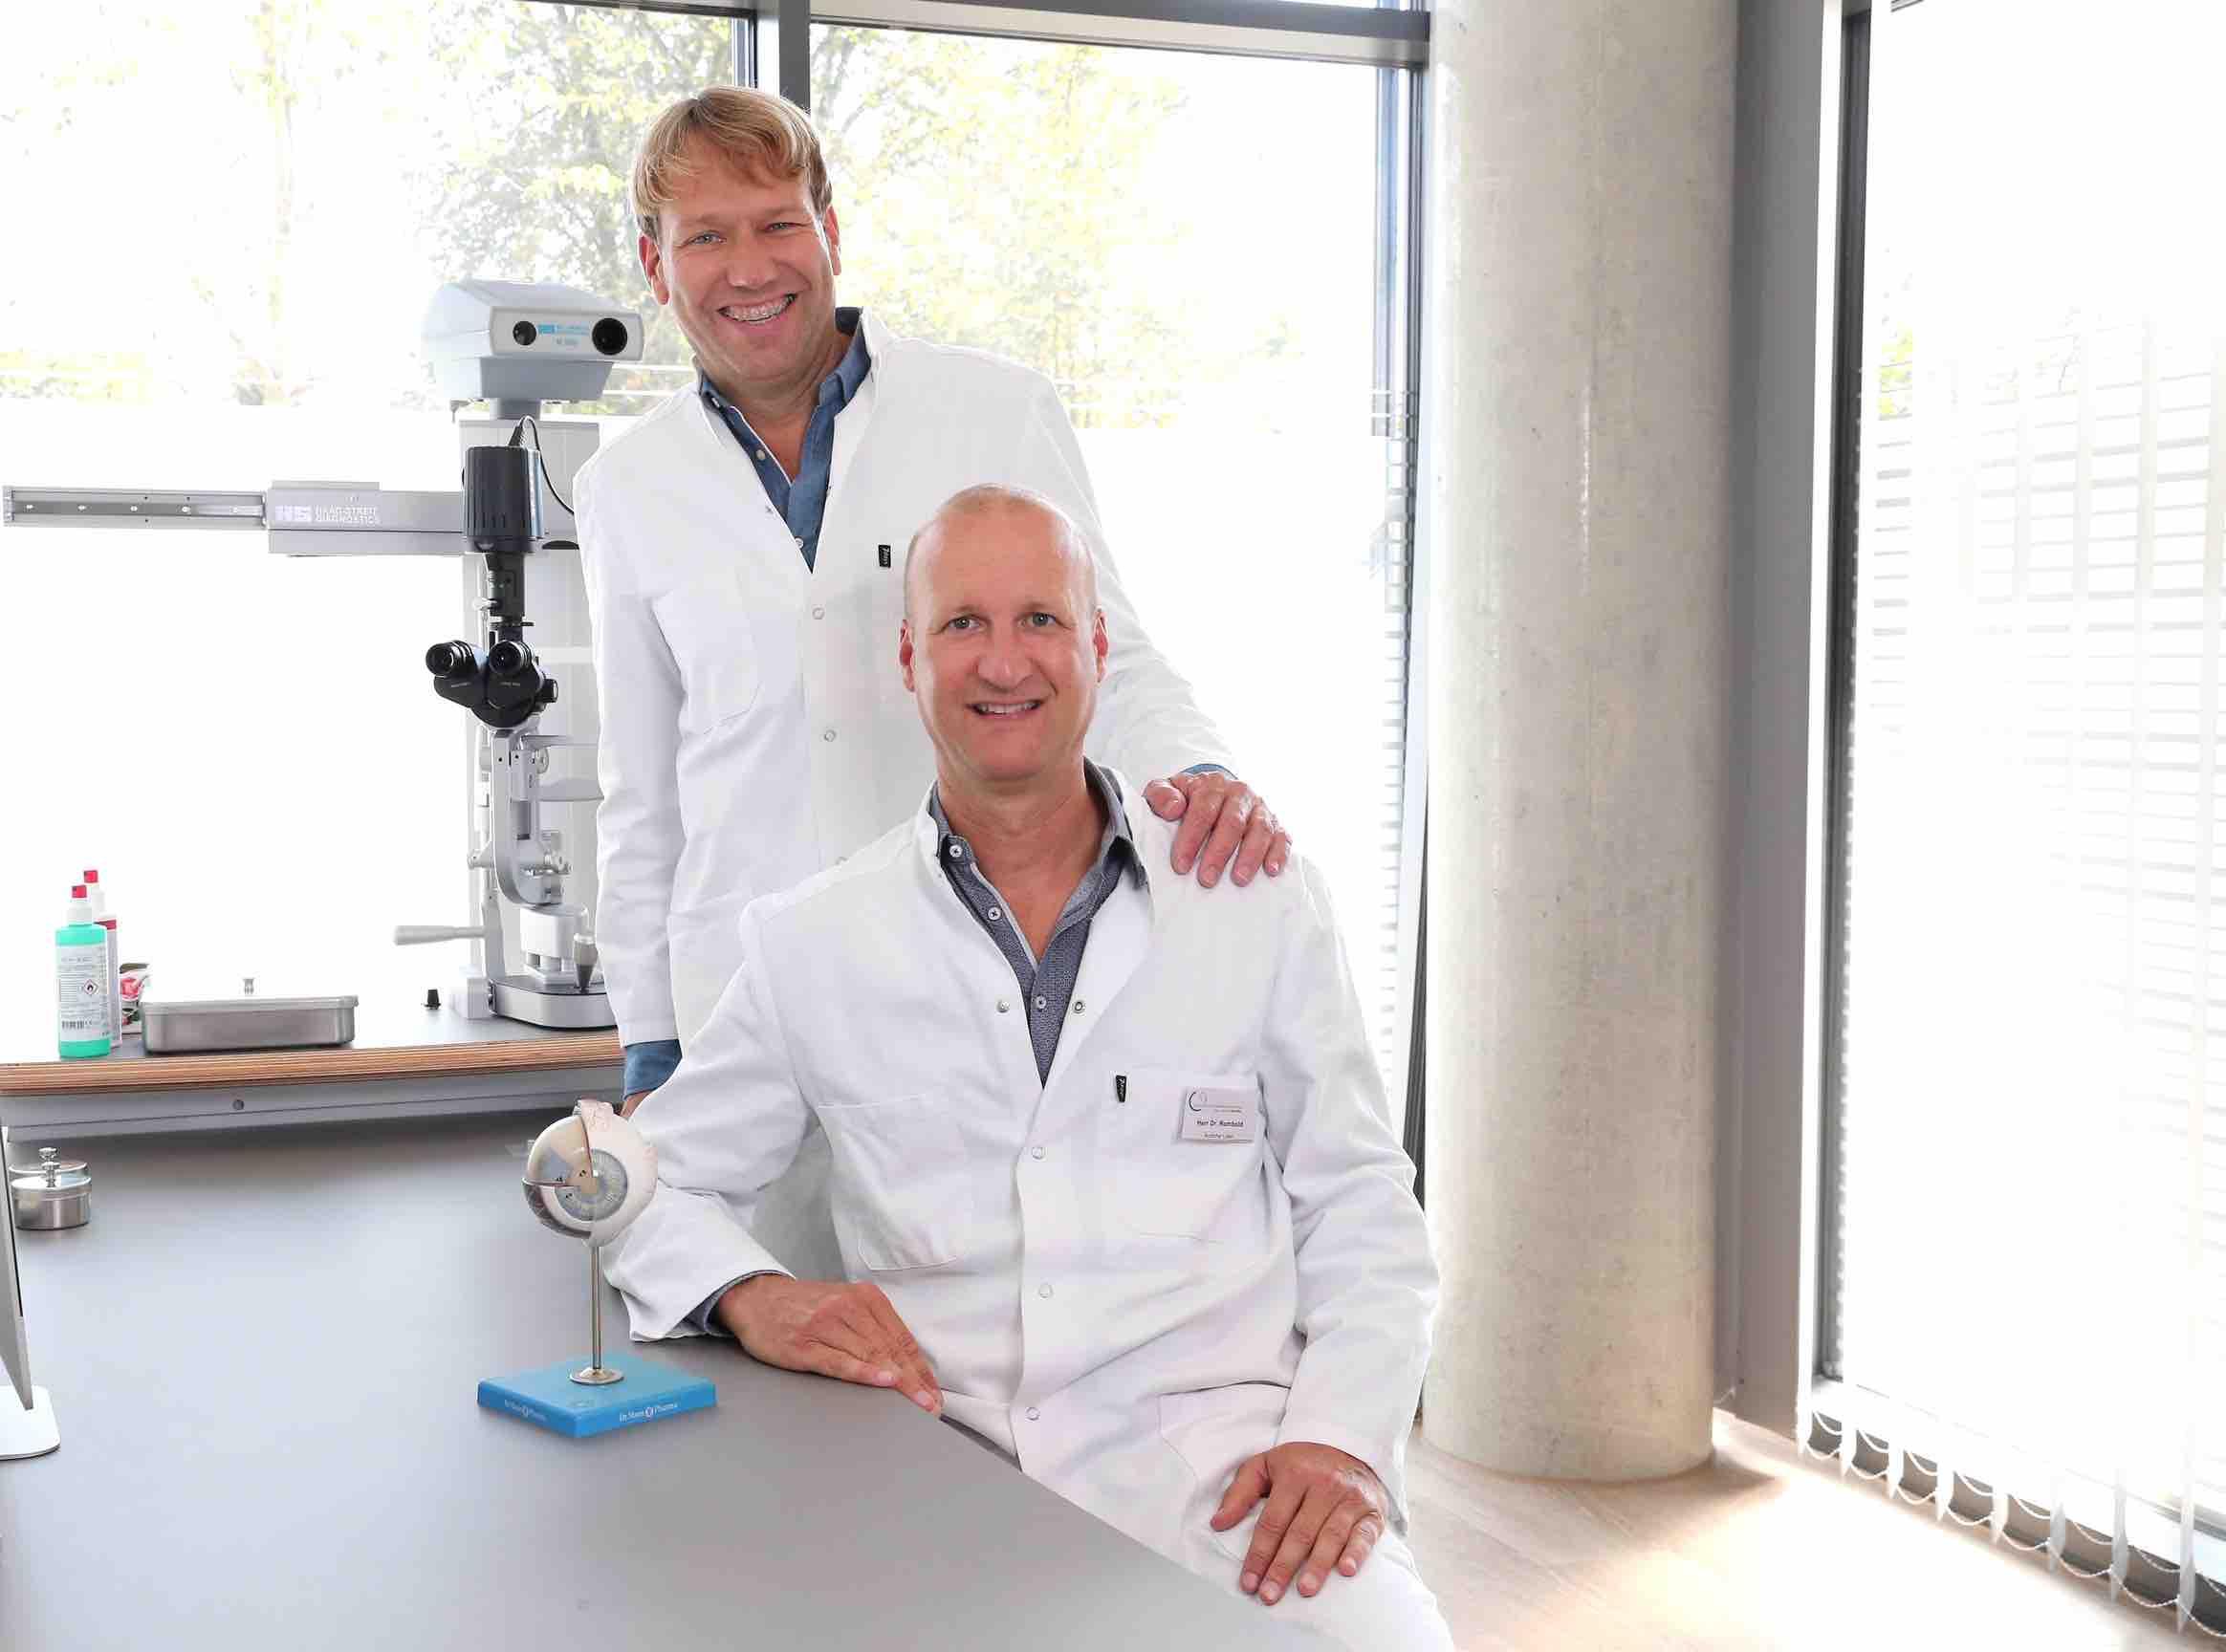 Augenspezialisten Dr. med. Christoph Niederdellmann and Dr. med. Felix Rombold